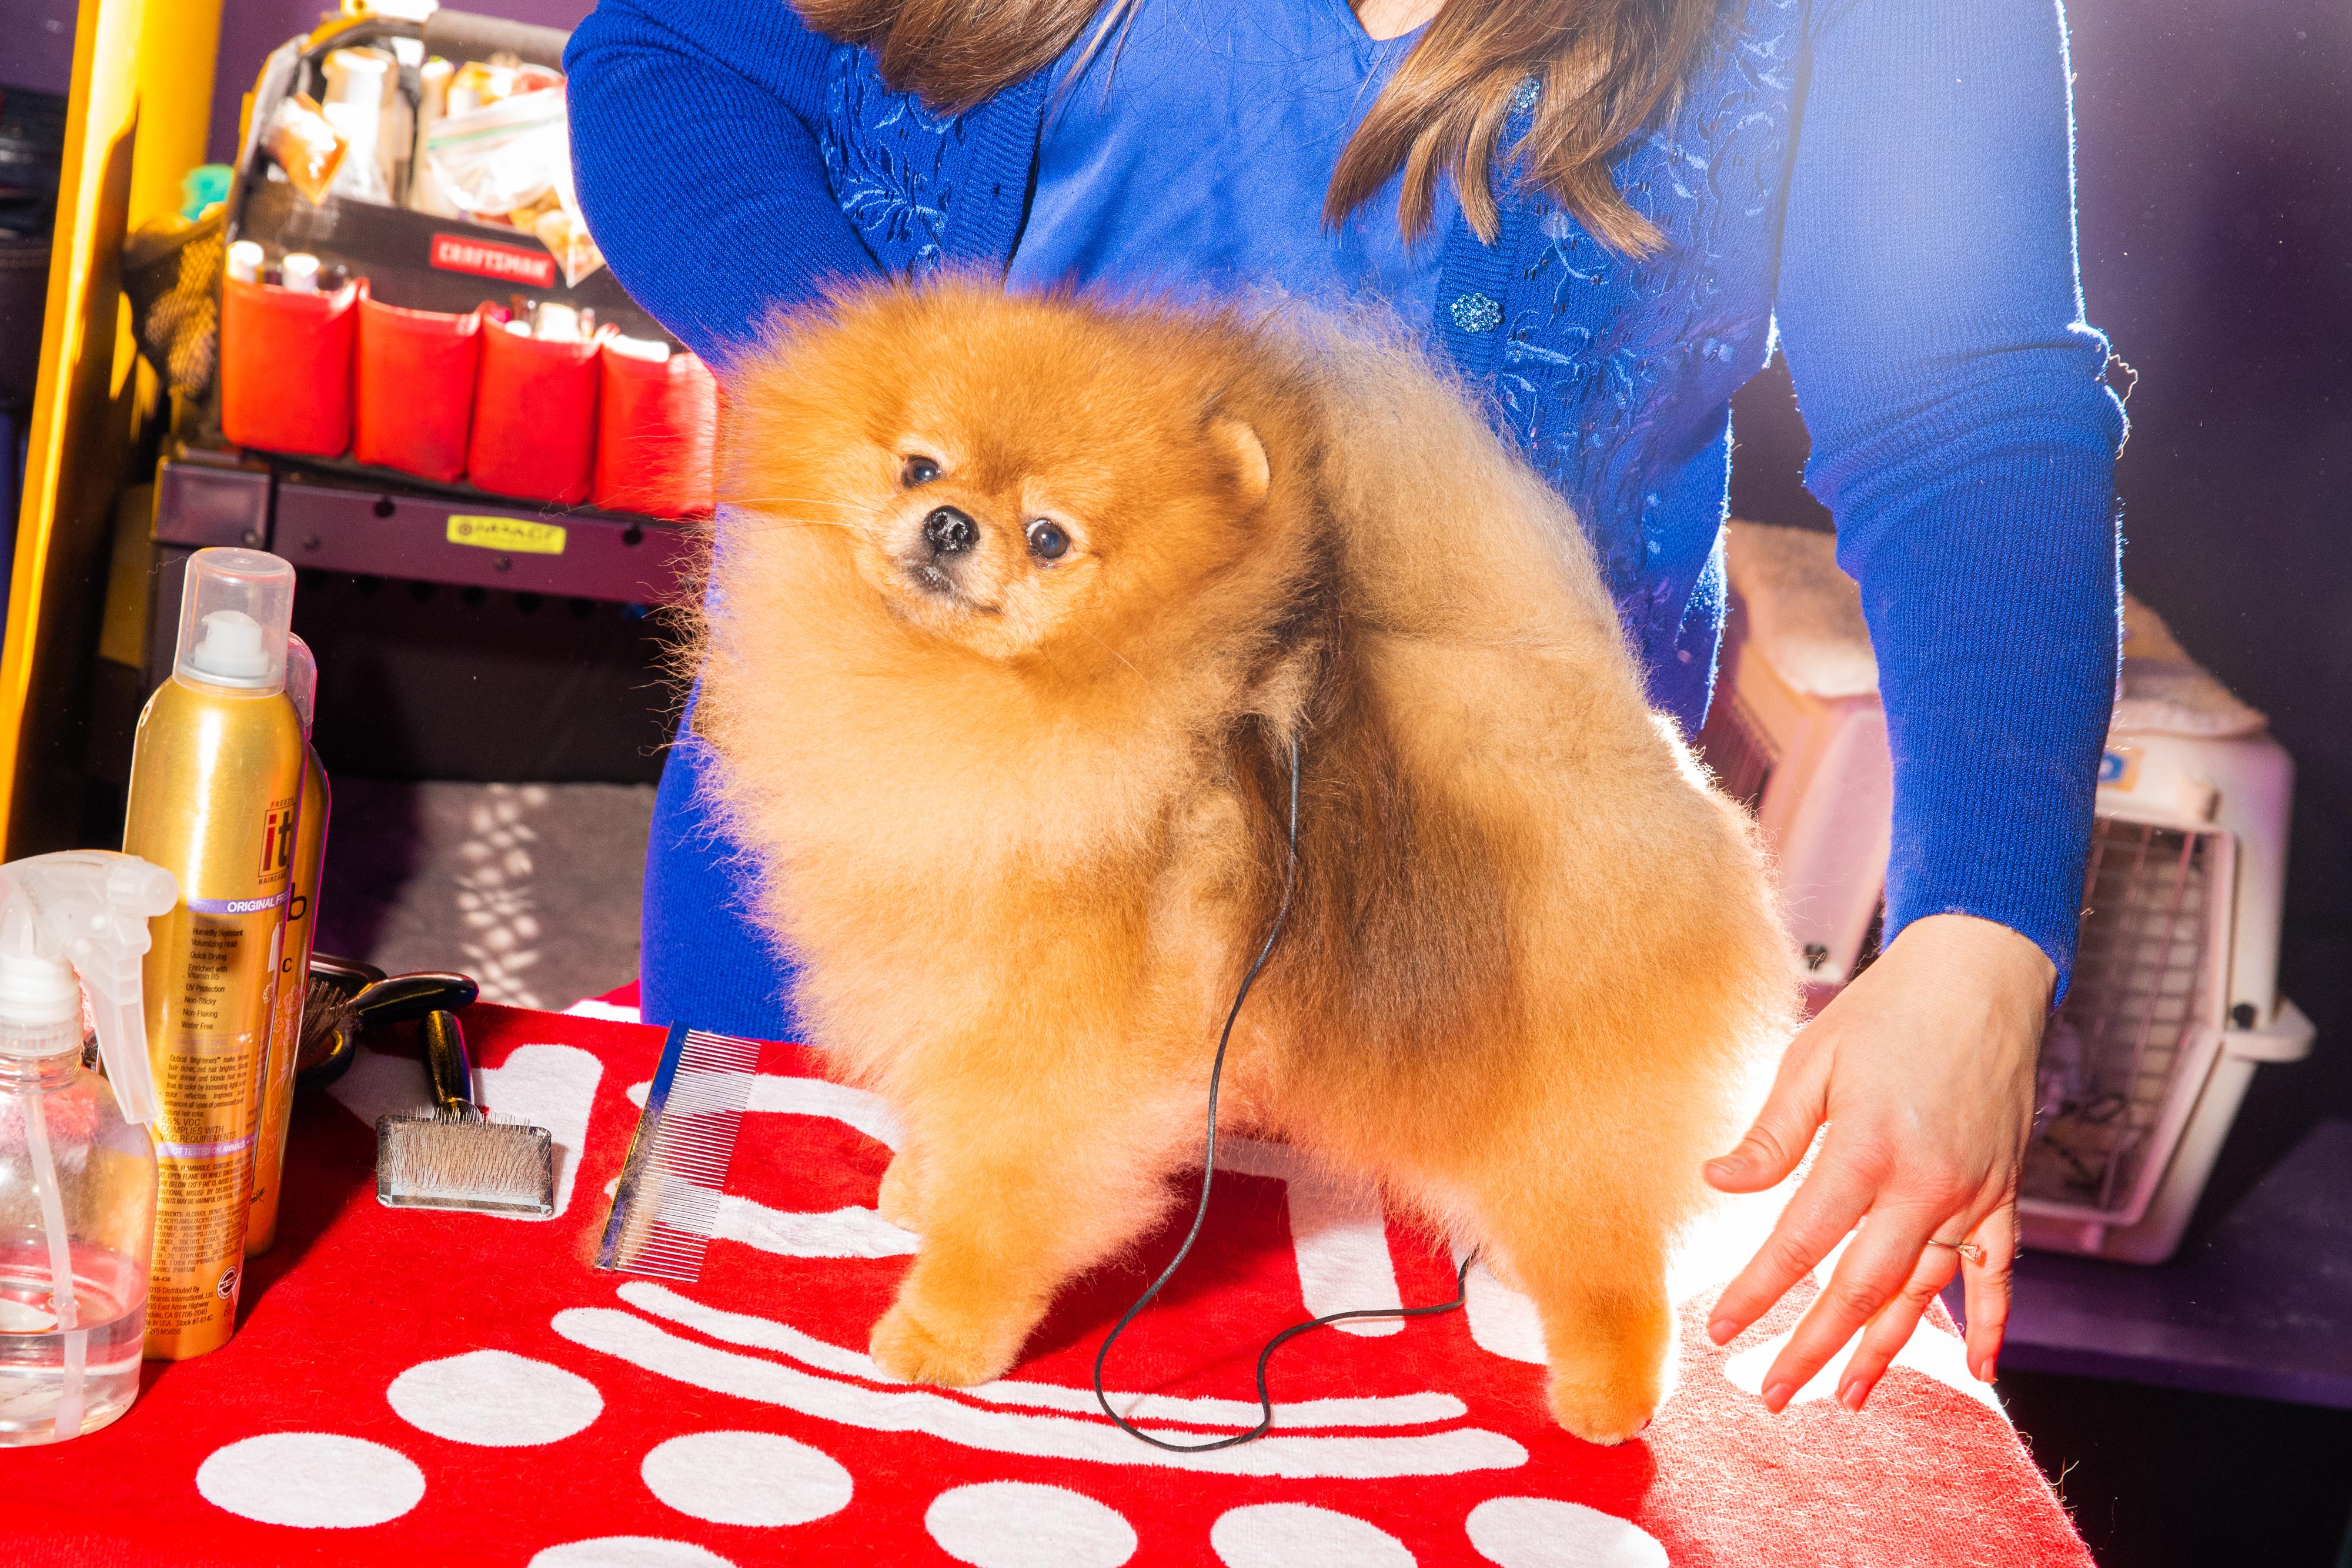 A Pomeranian receives a final touch up